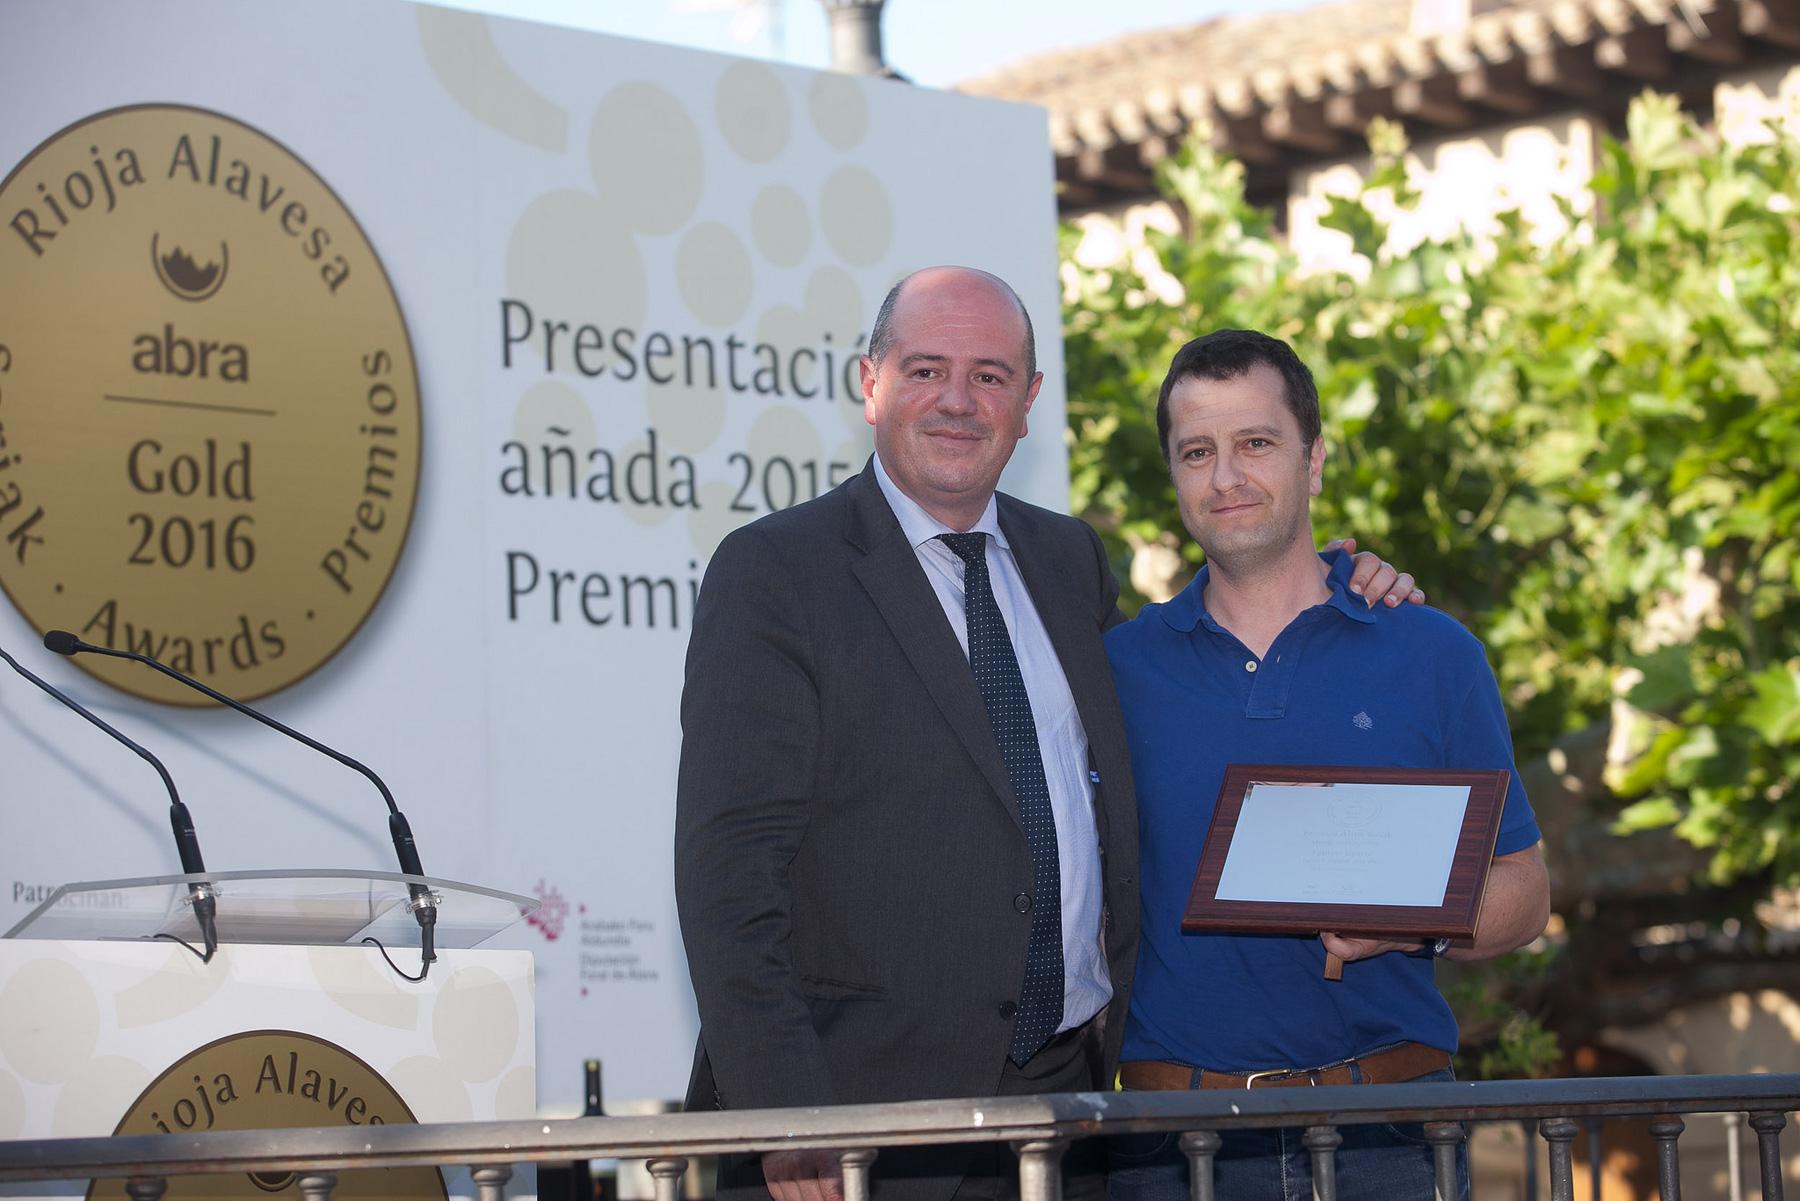 premios_ABRA.jpg